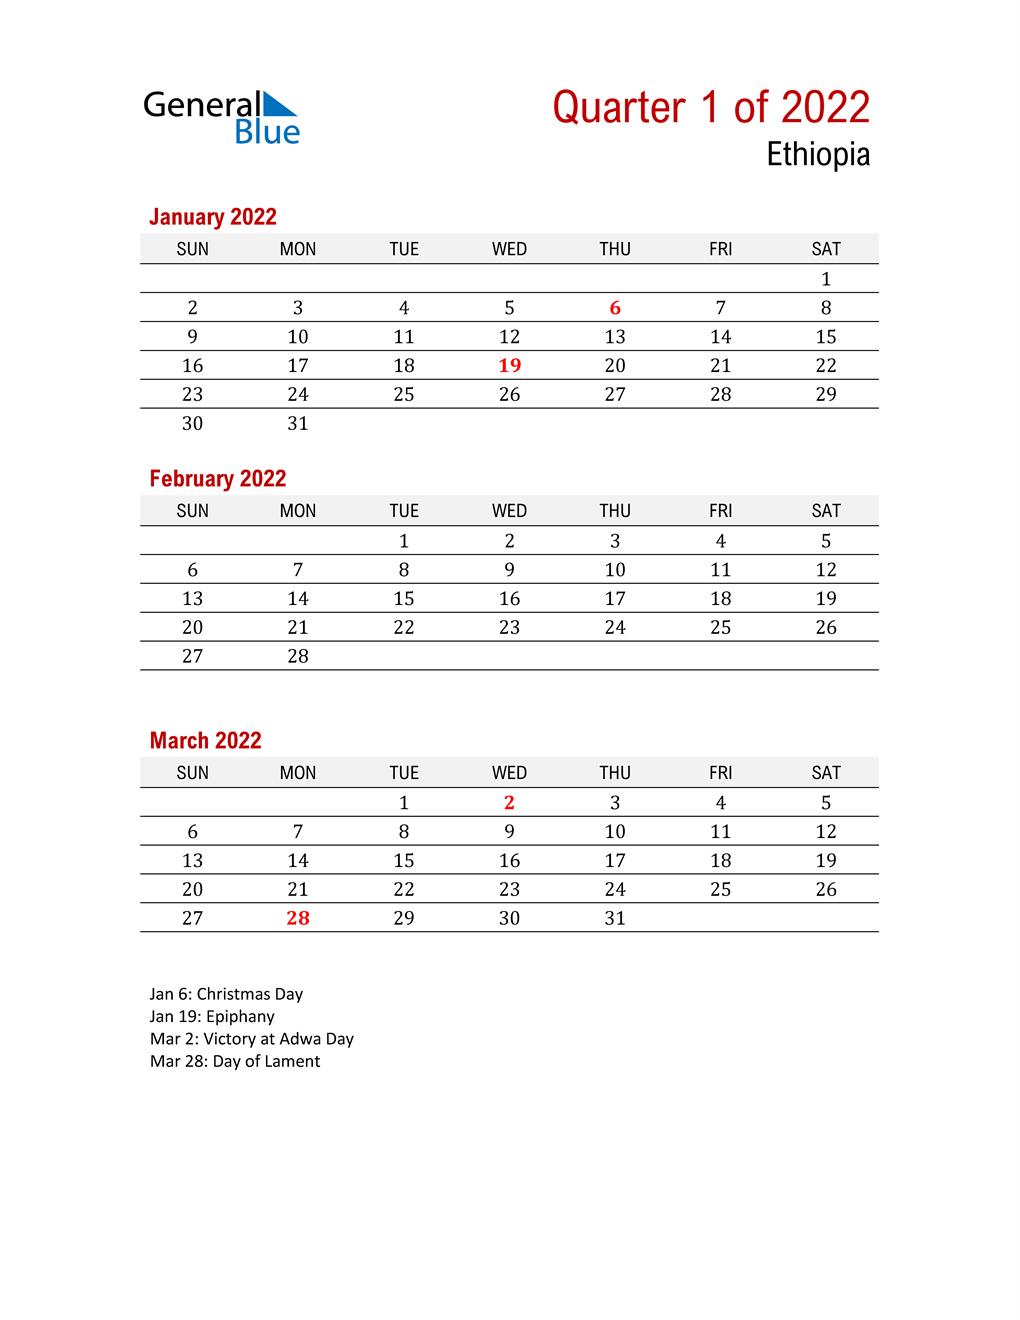 Printable Three Month Calendar for Ethiopia